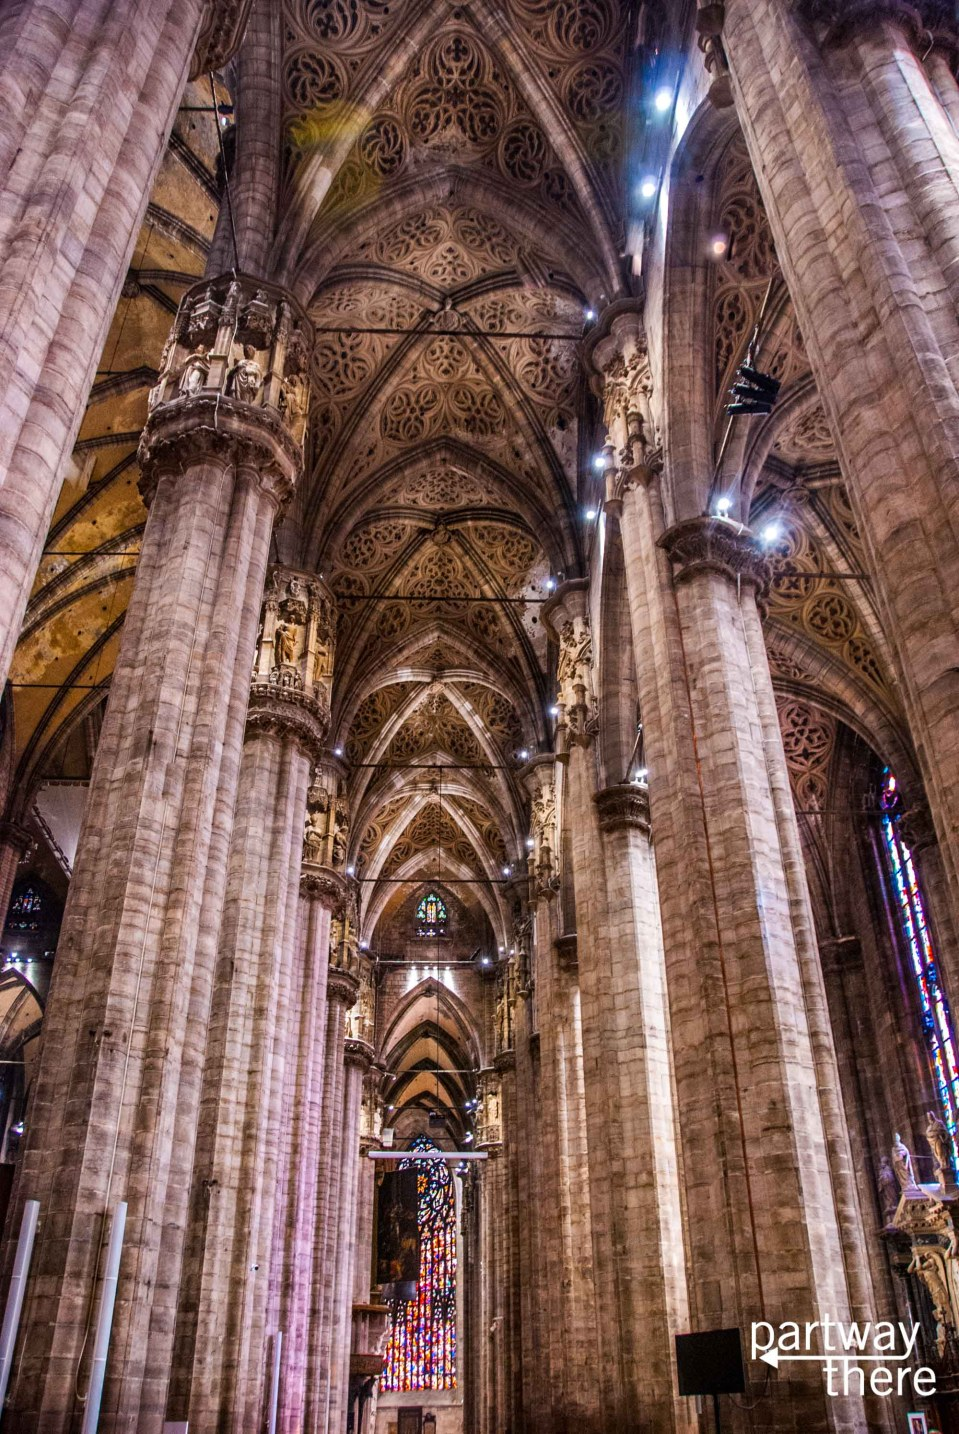 Inside the Duomo in Milan, Italy